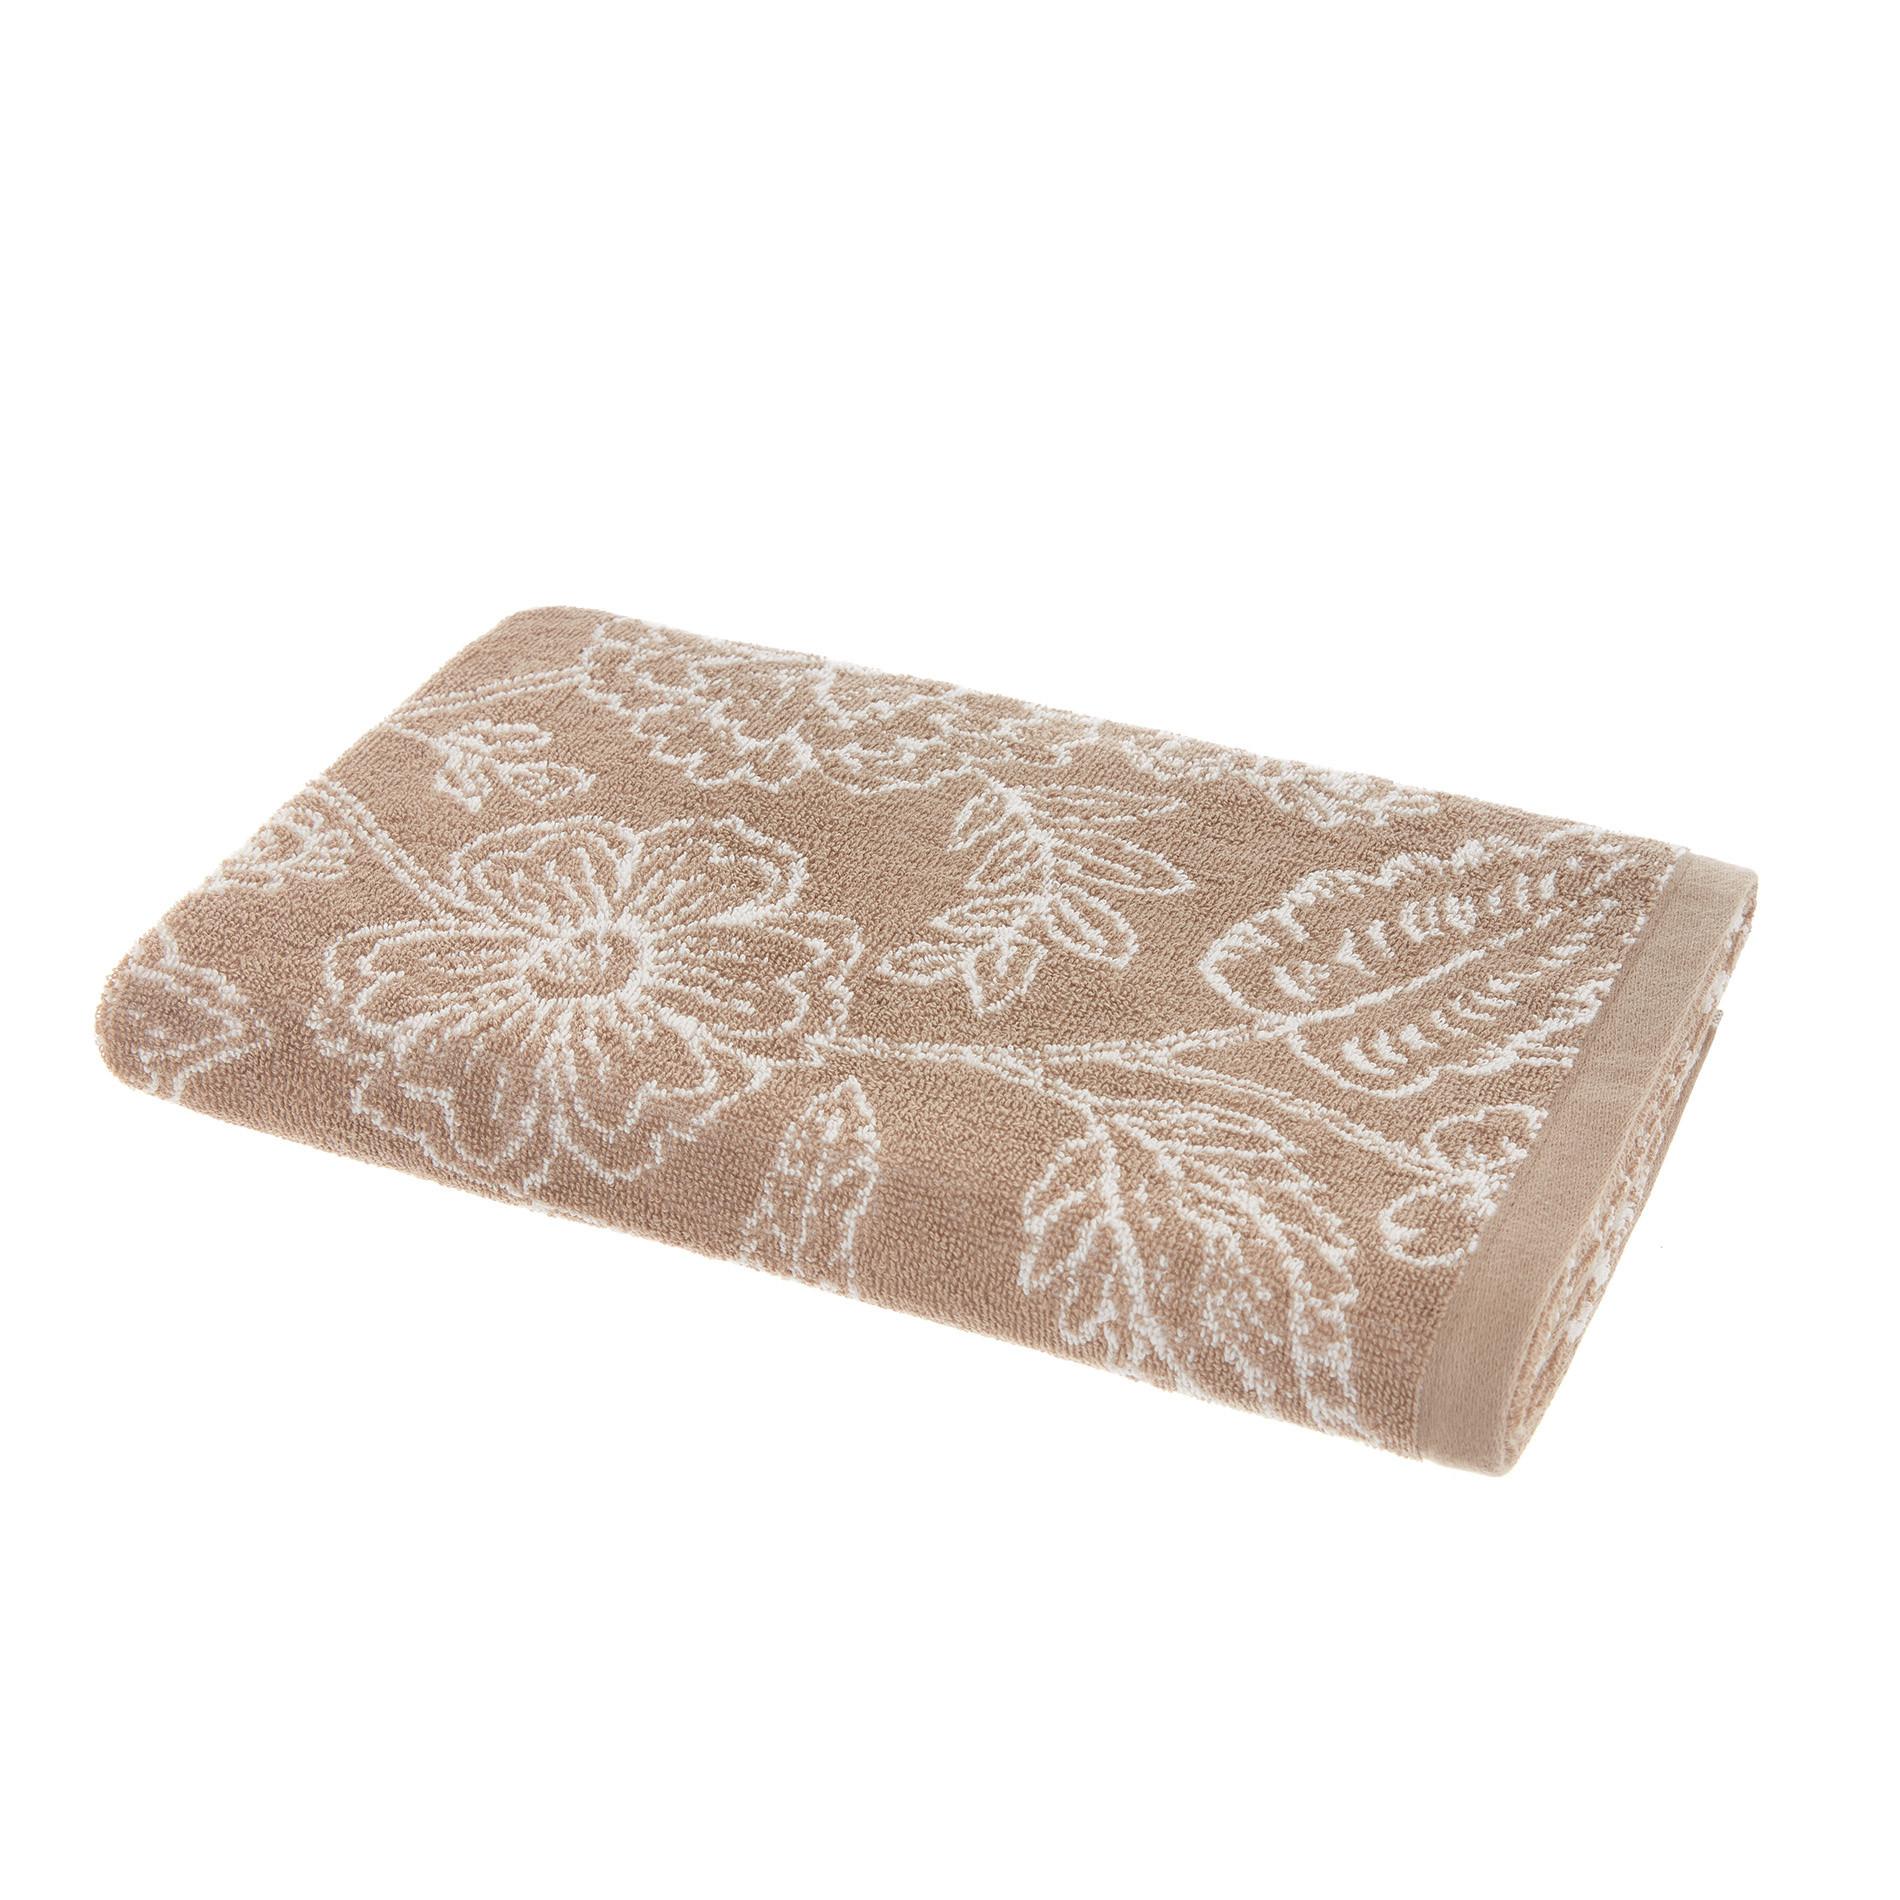 Asciugamano spugna di cotone fantasia floreale, Beige, large image number 1